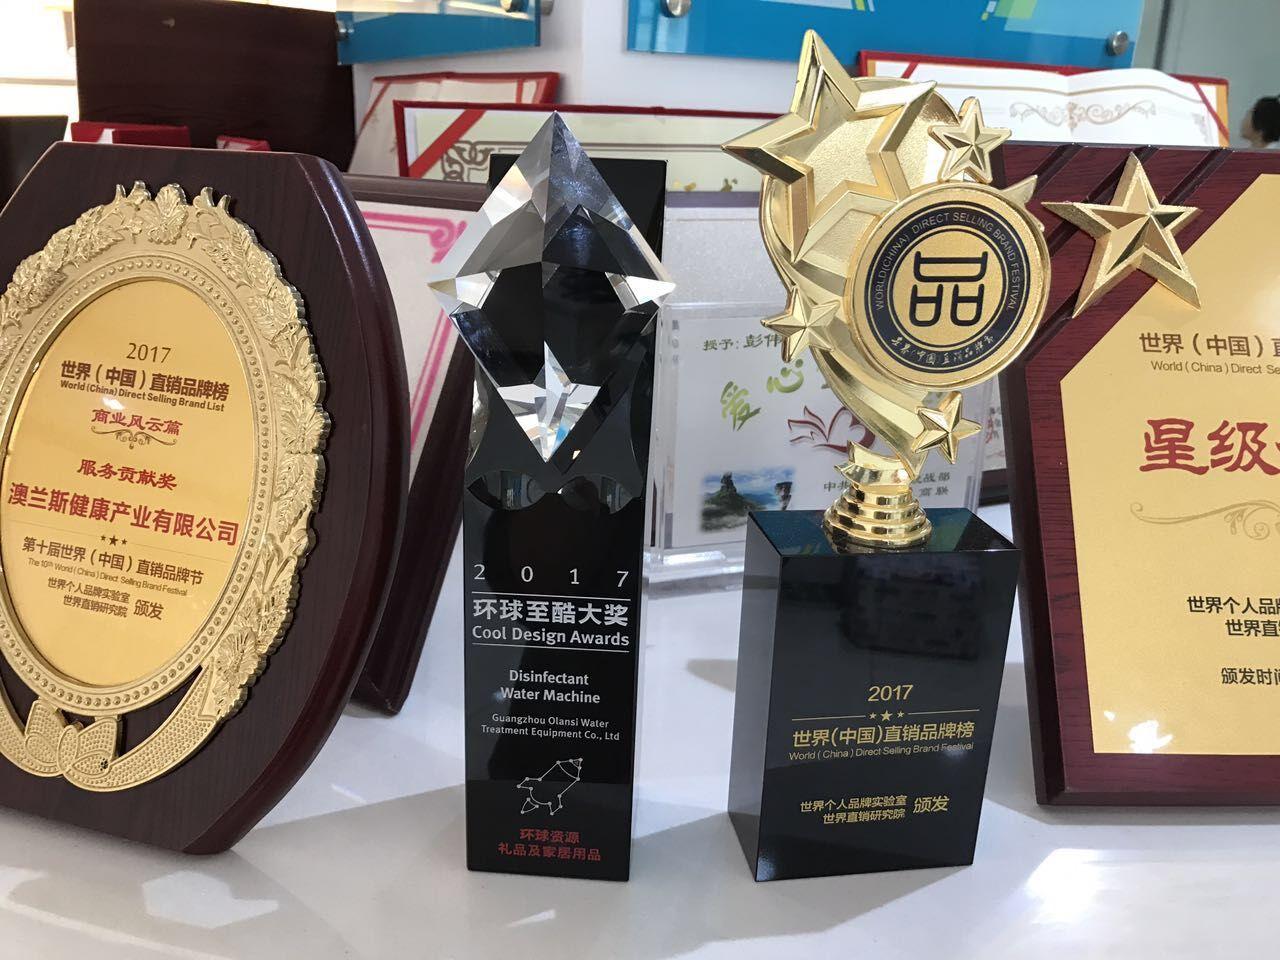 Cool Design Awards 3